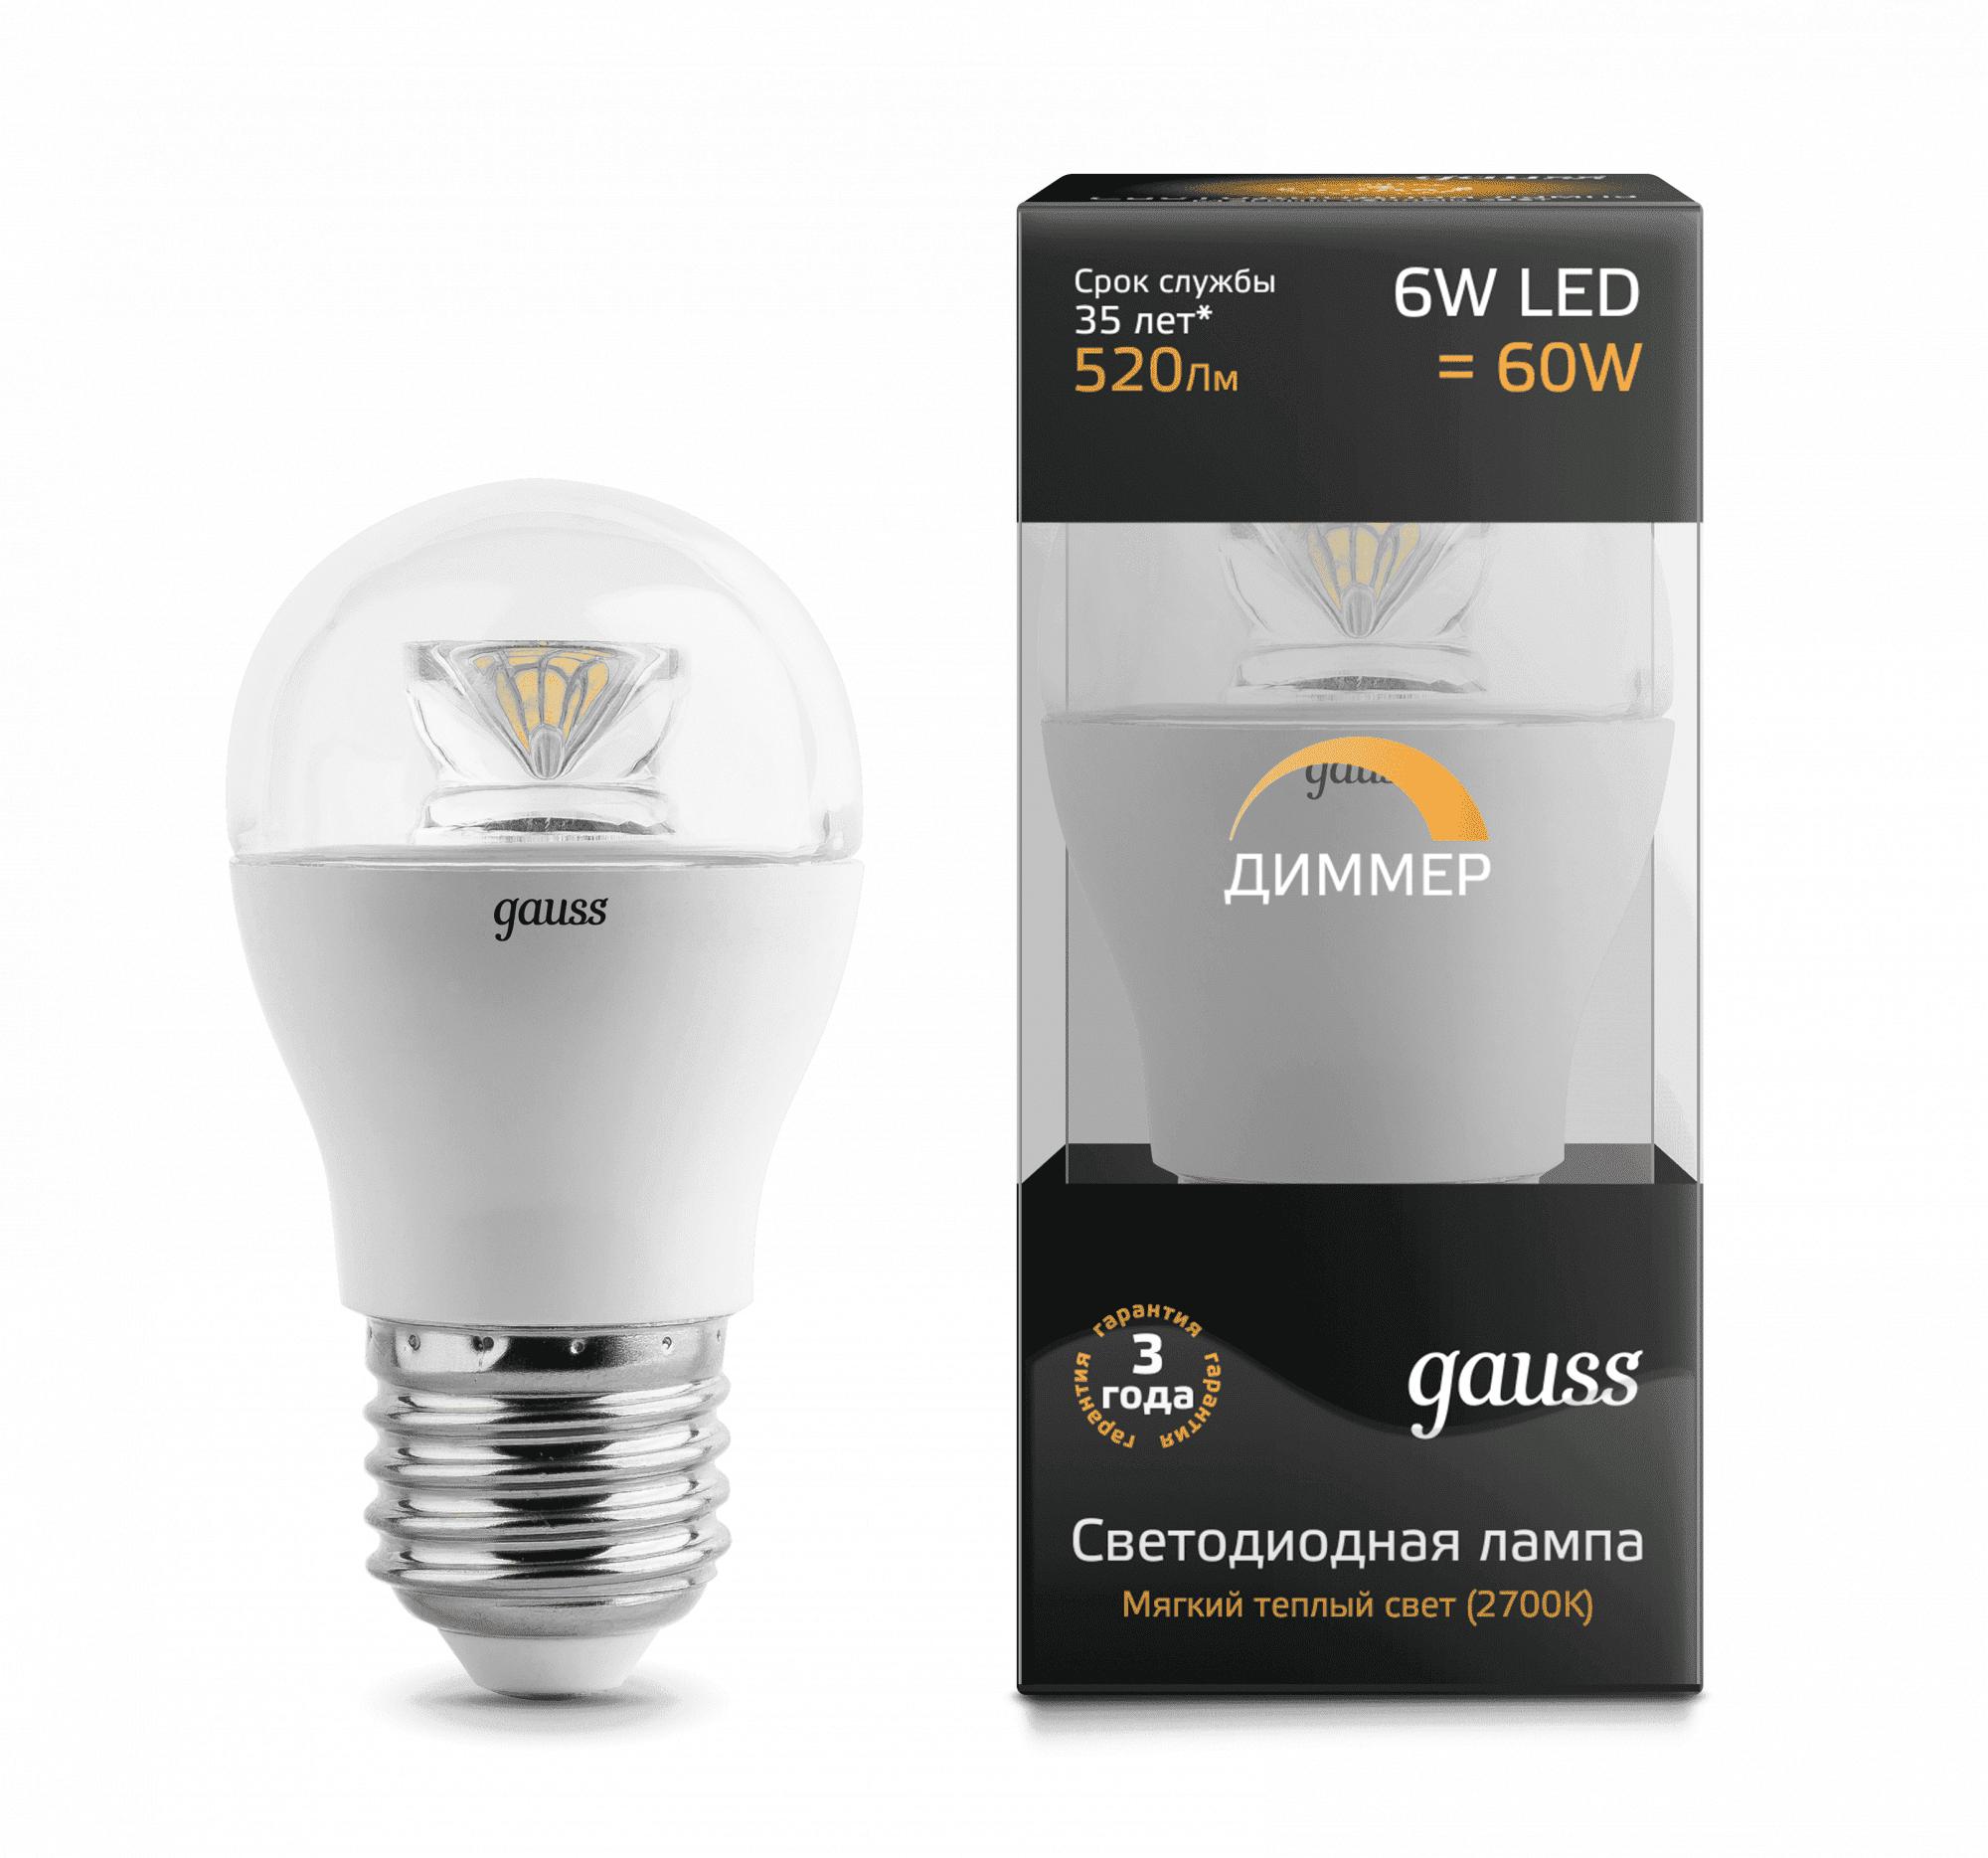 Gauss LED Globe-dim Crystal Clear E27 6W 2700K диммируемая 1/10/50 арт. 105202106-D